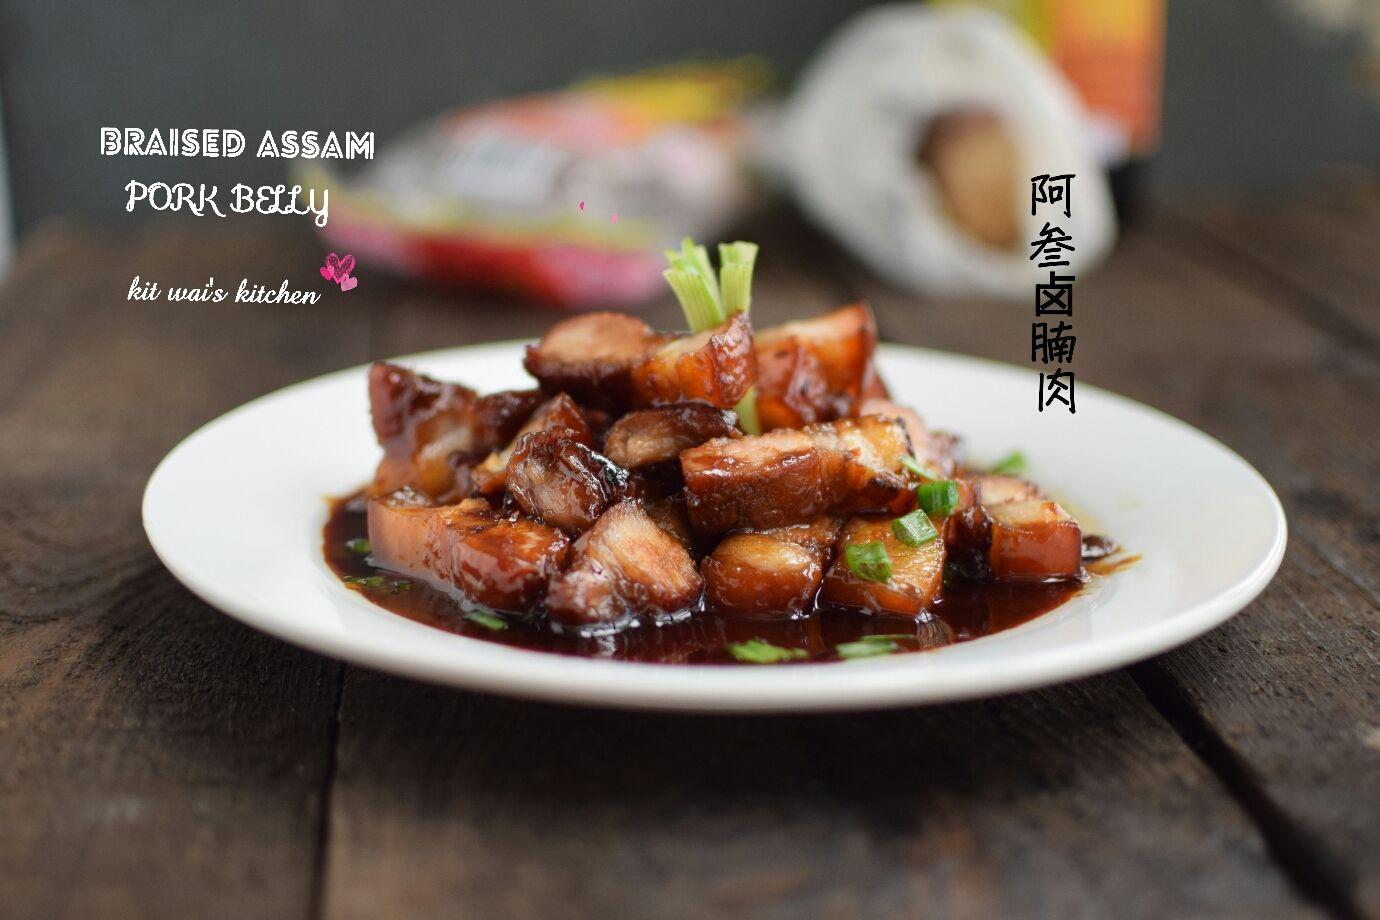 Kit Waiu0027s Kitchen : 亚叁卤腩肉 ~ Braised Assam Pork Belly